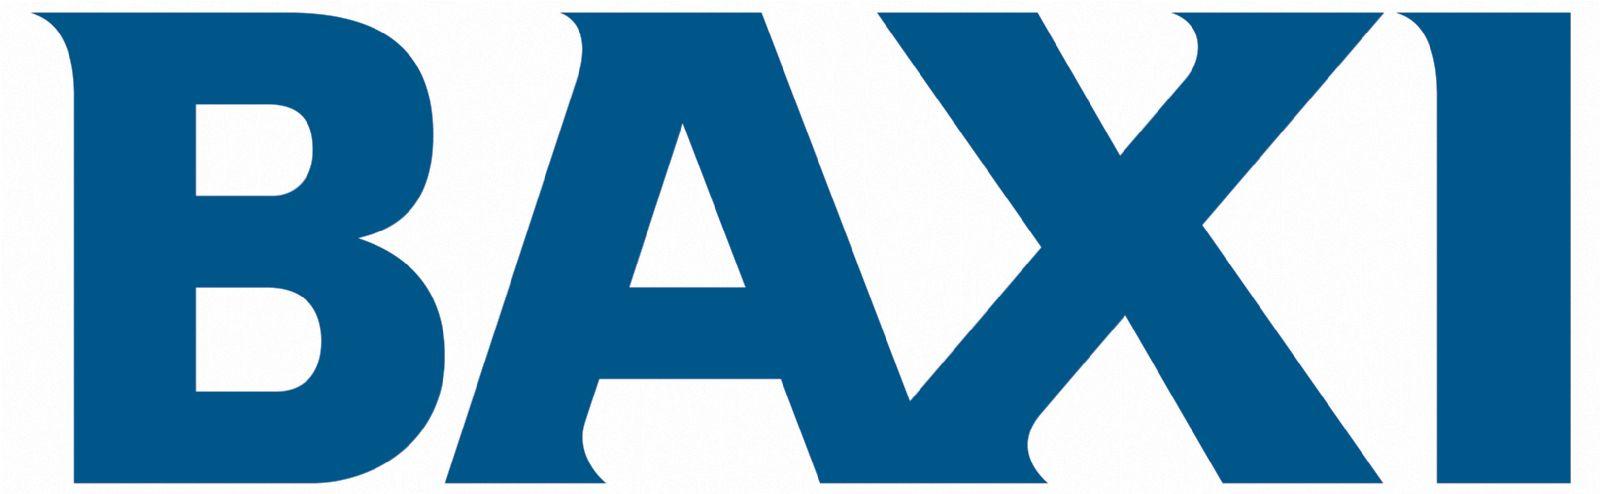 Baxi Logo Wallpaper